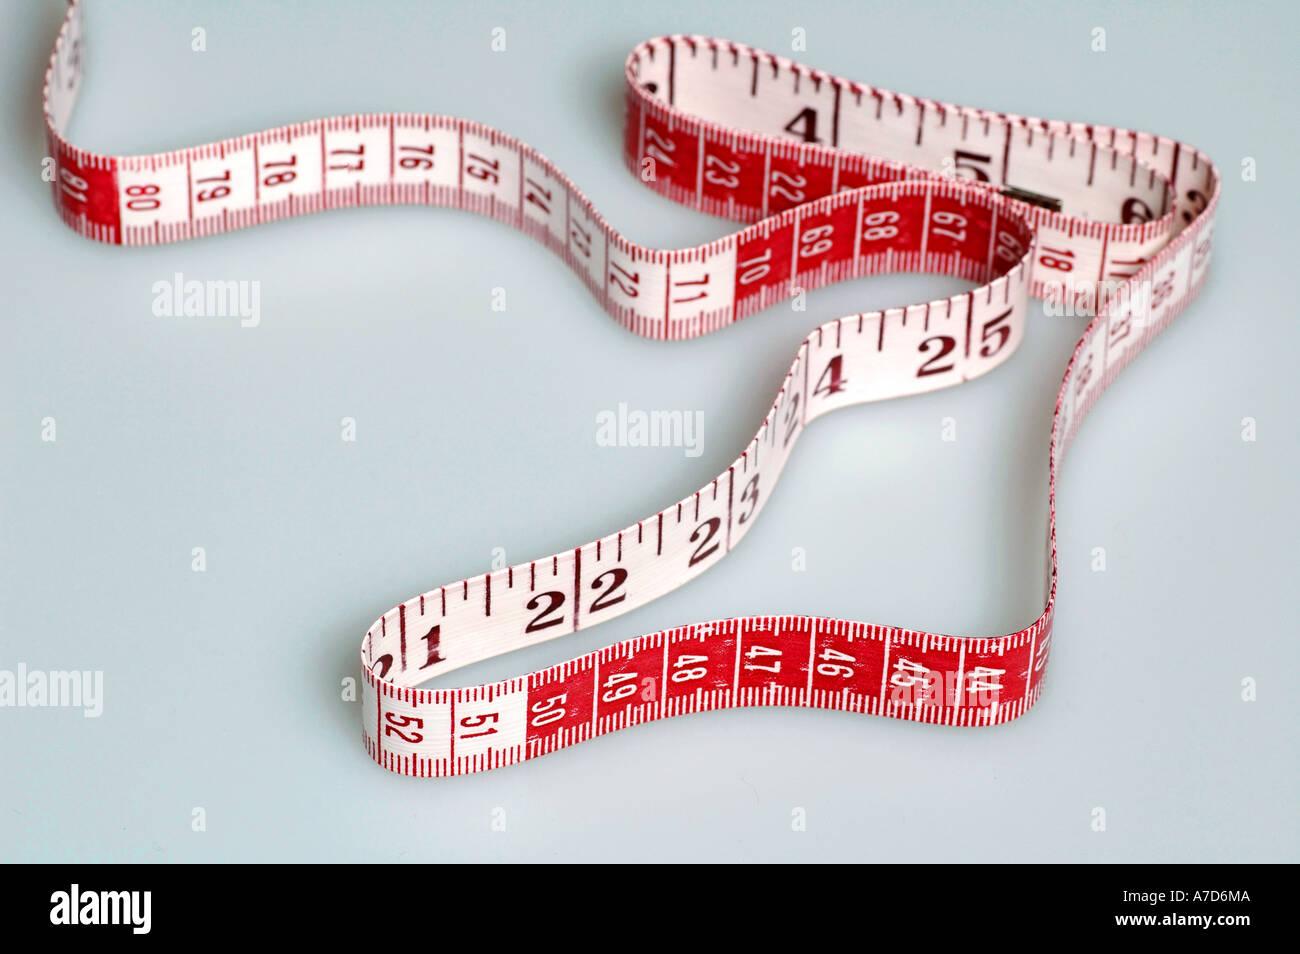 Measuring tape, metric tape measure for needlework, sewing work etc.. Stock Photo